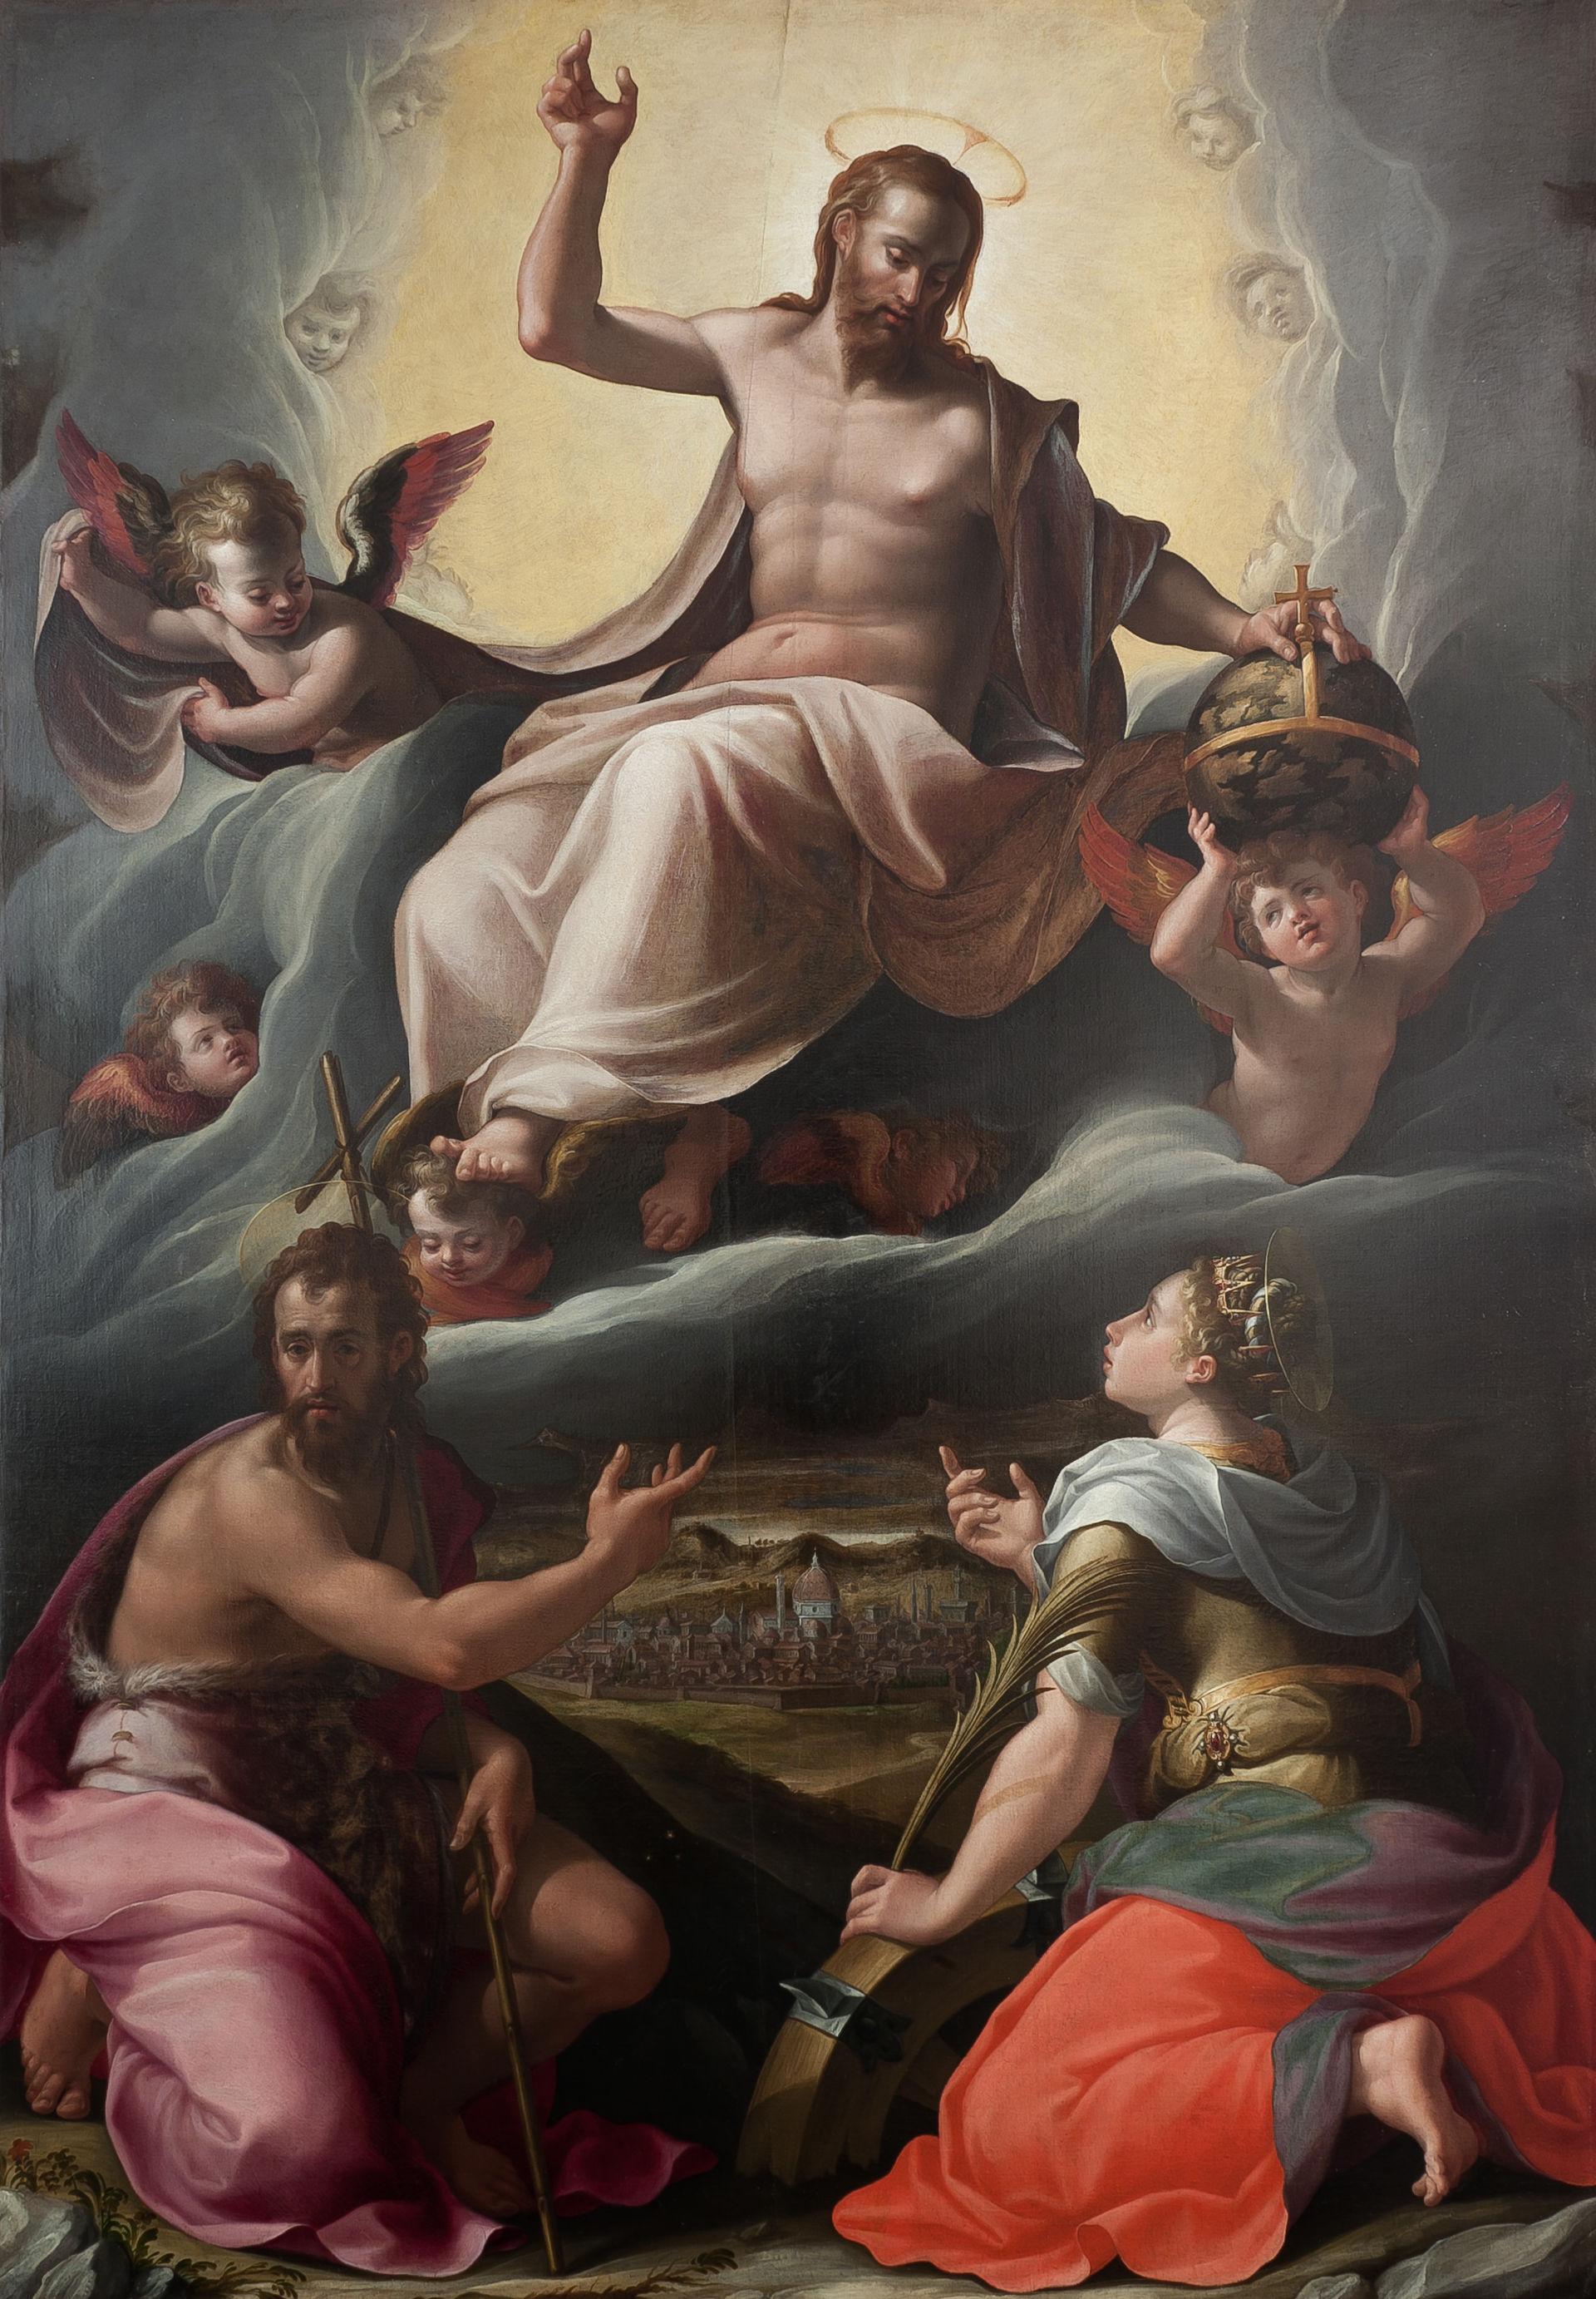 Girolamo Macchietti - Wikipedia